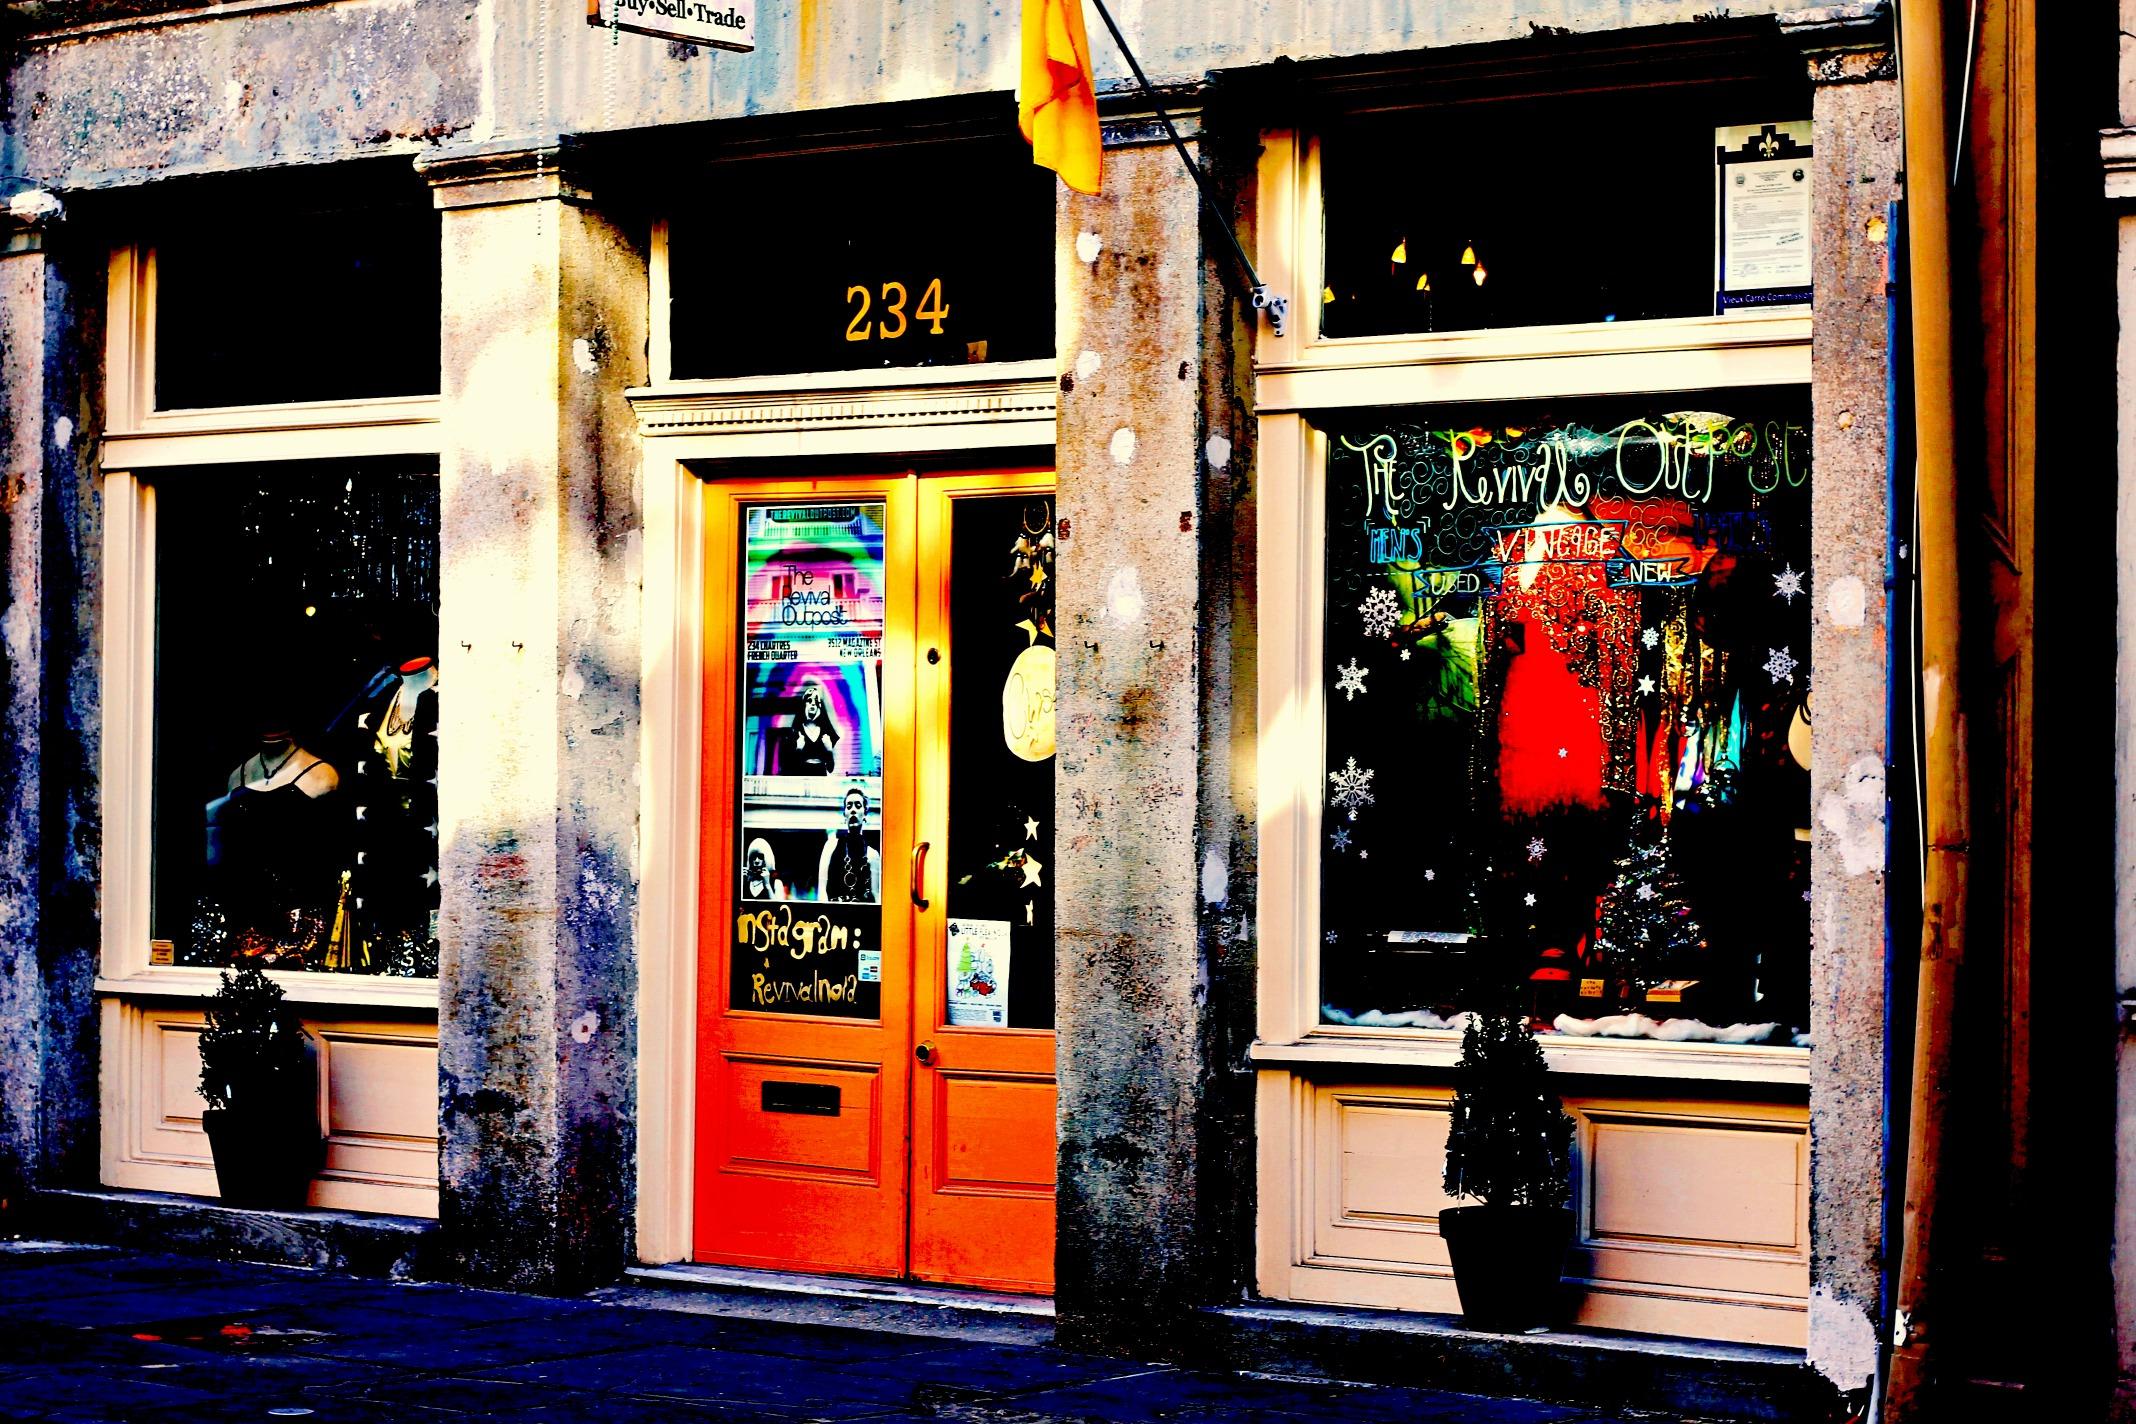 bourbon street store front new orleans stop look shoot. Black Bedroom Furniture Sets. Home Design Ideas